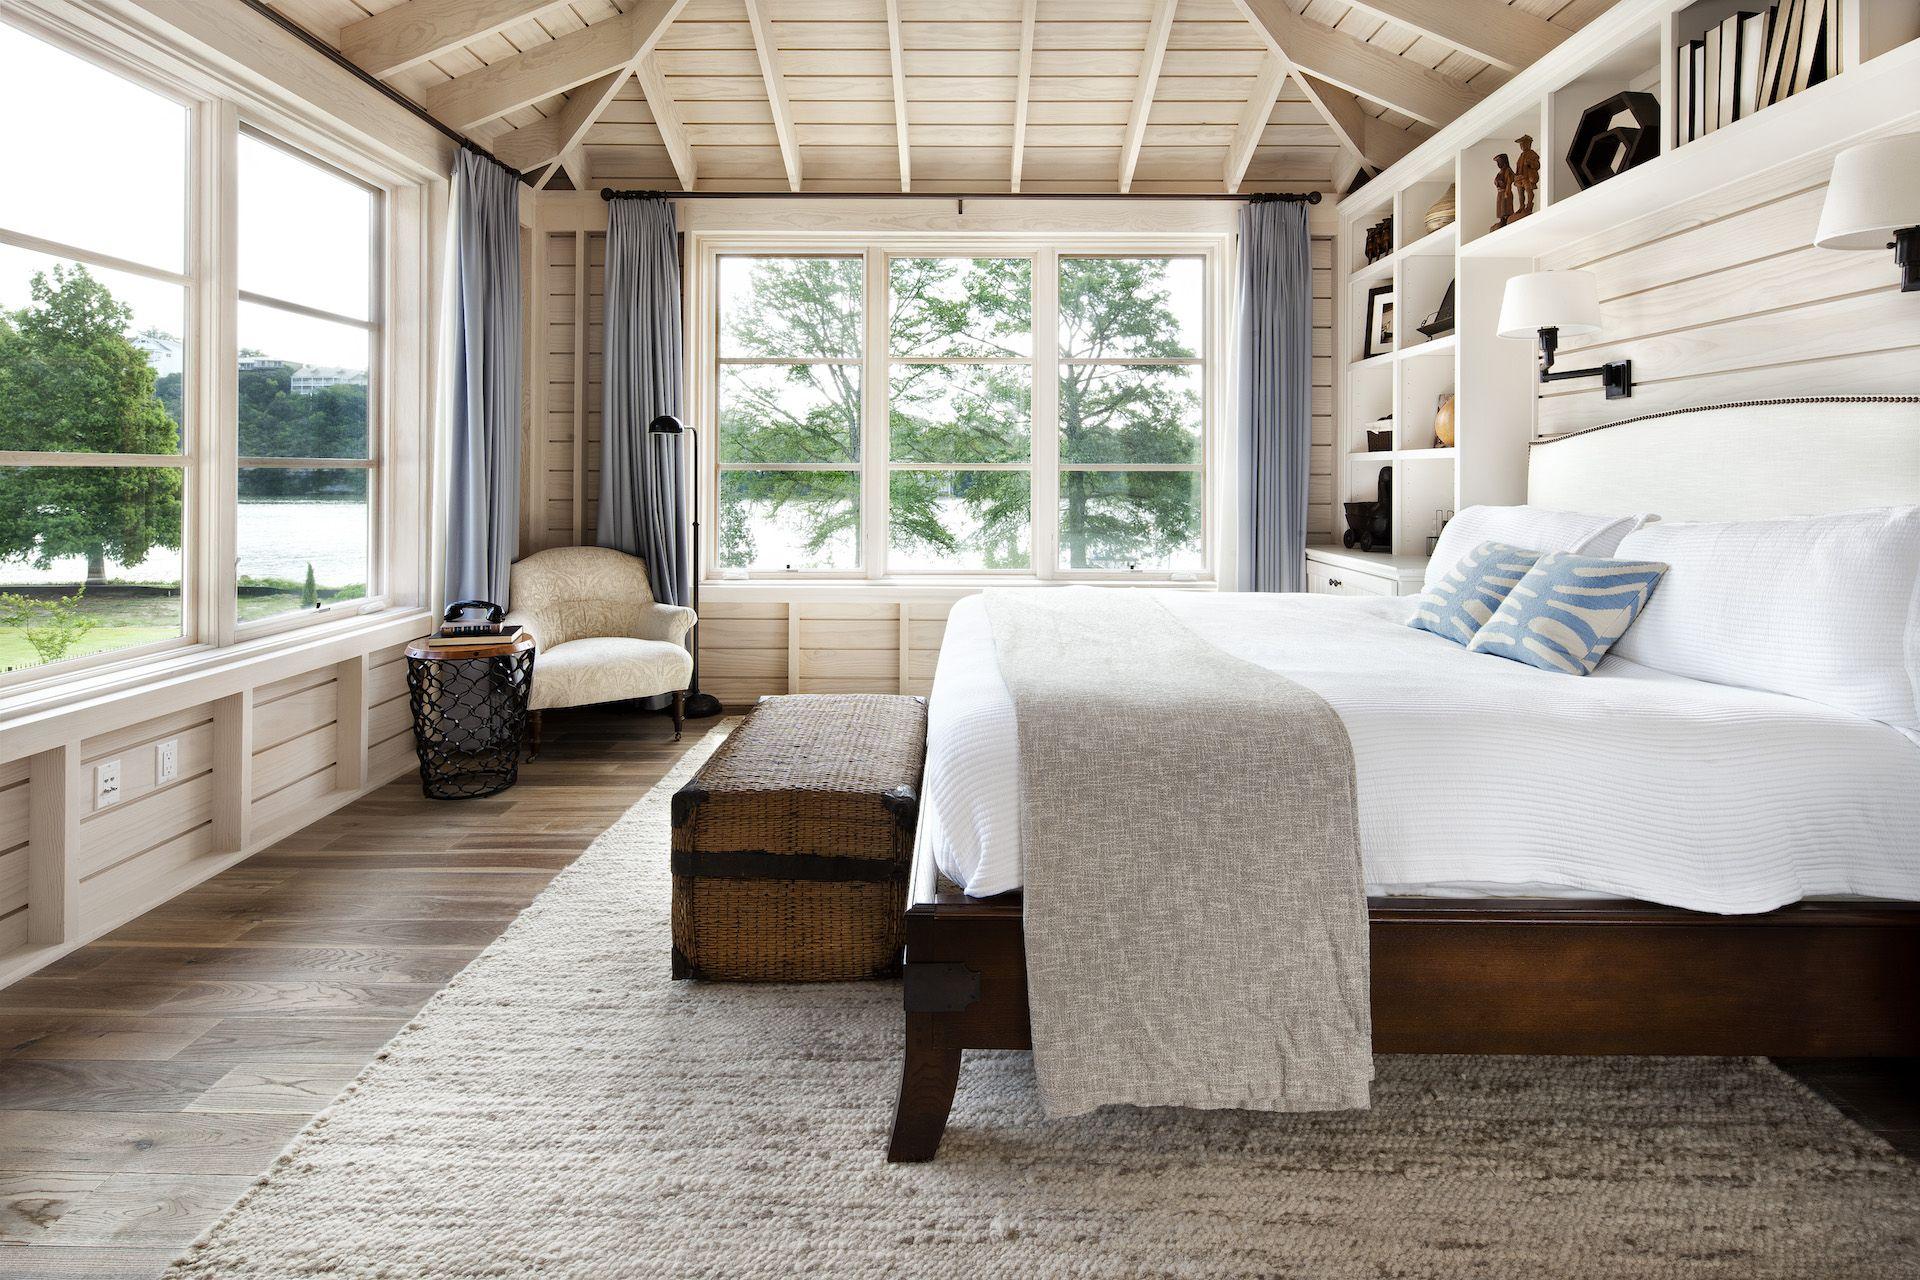 Image Result For Modern Cottage Bedroom Ideas Modern Rustic Bedrooms Contemporary Bedroom Home Bedroom